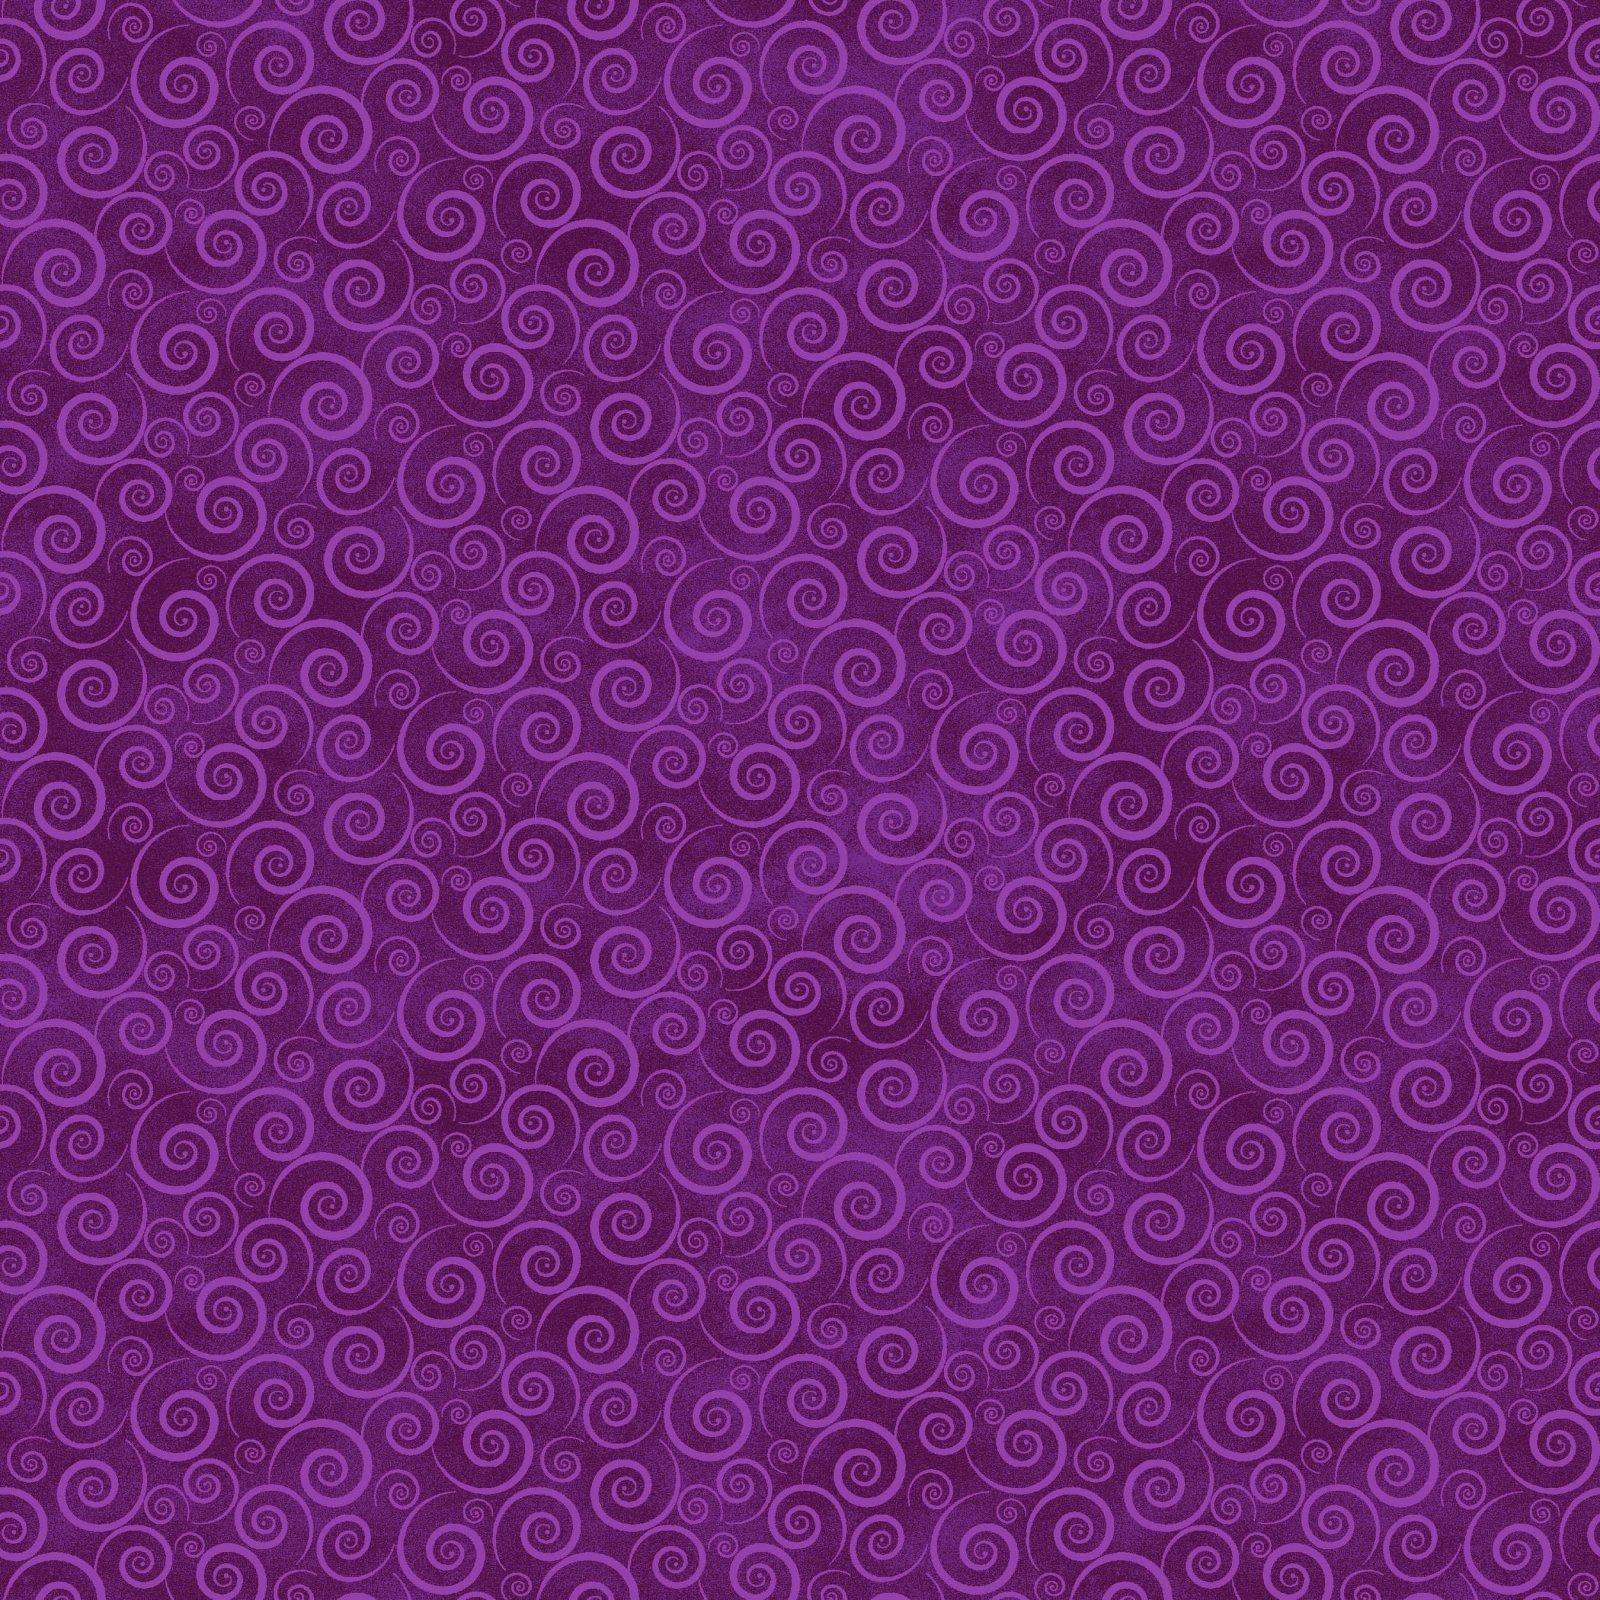 P3-462 Baltimore Spring DK Purple Swirl